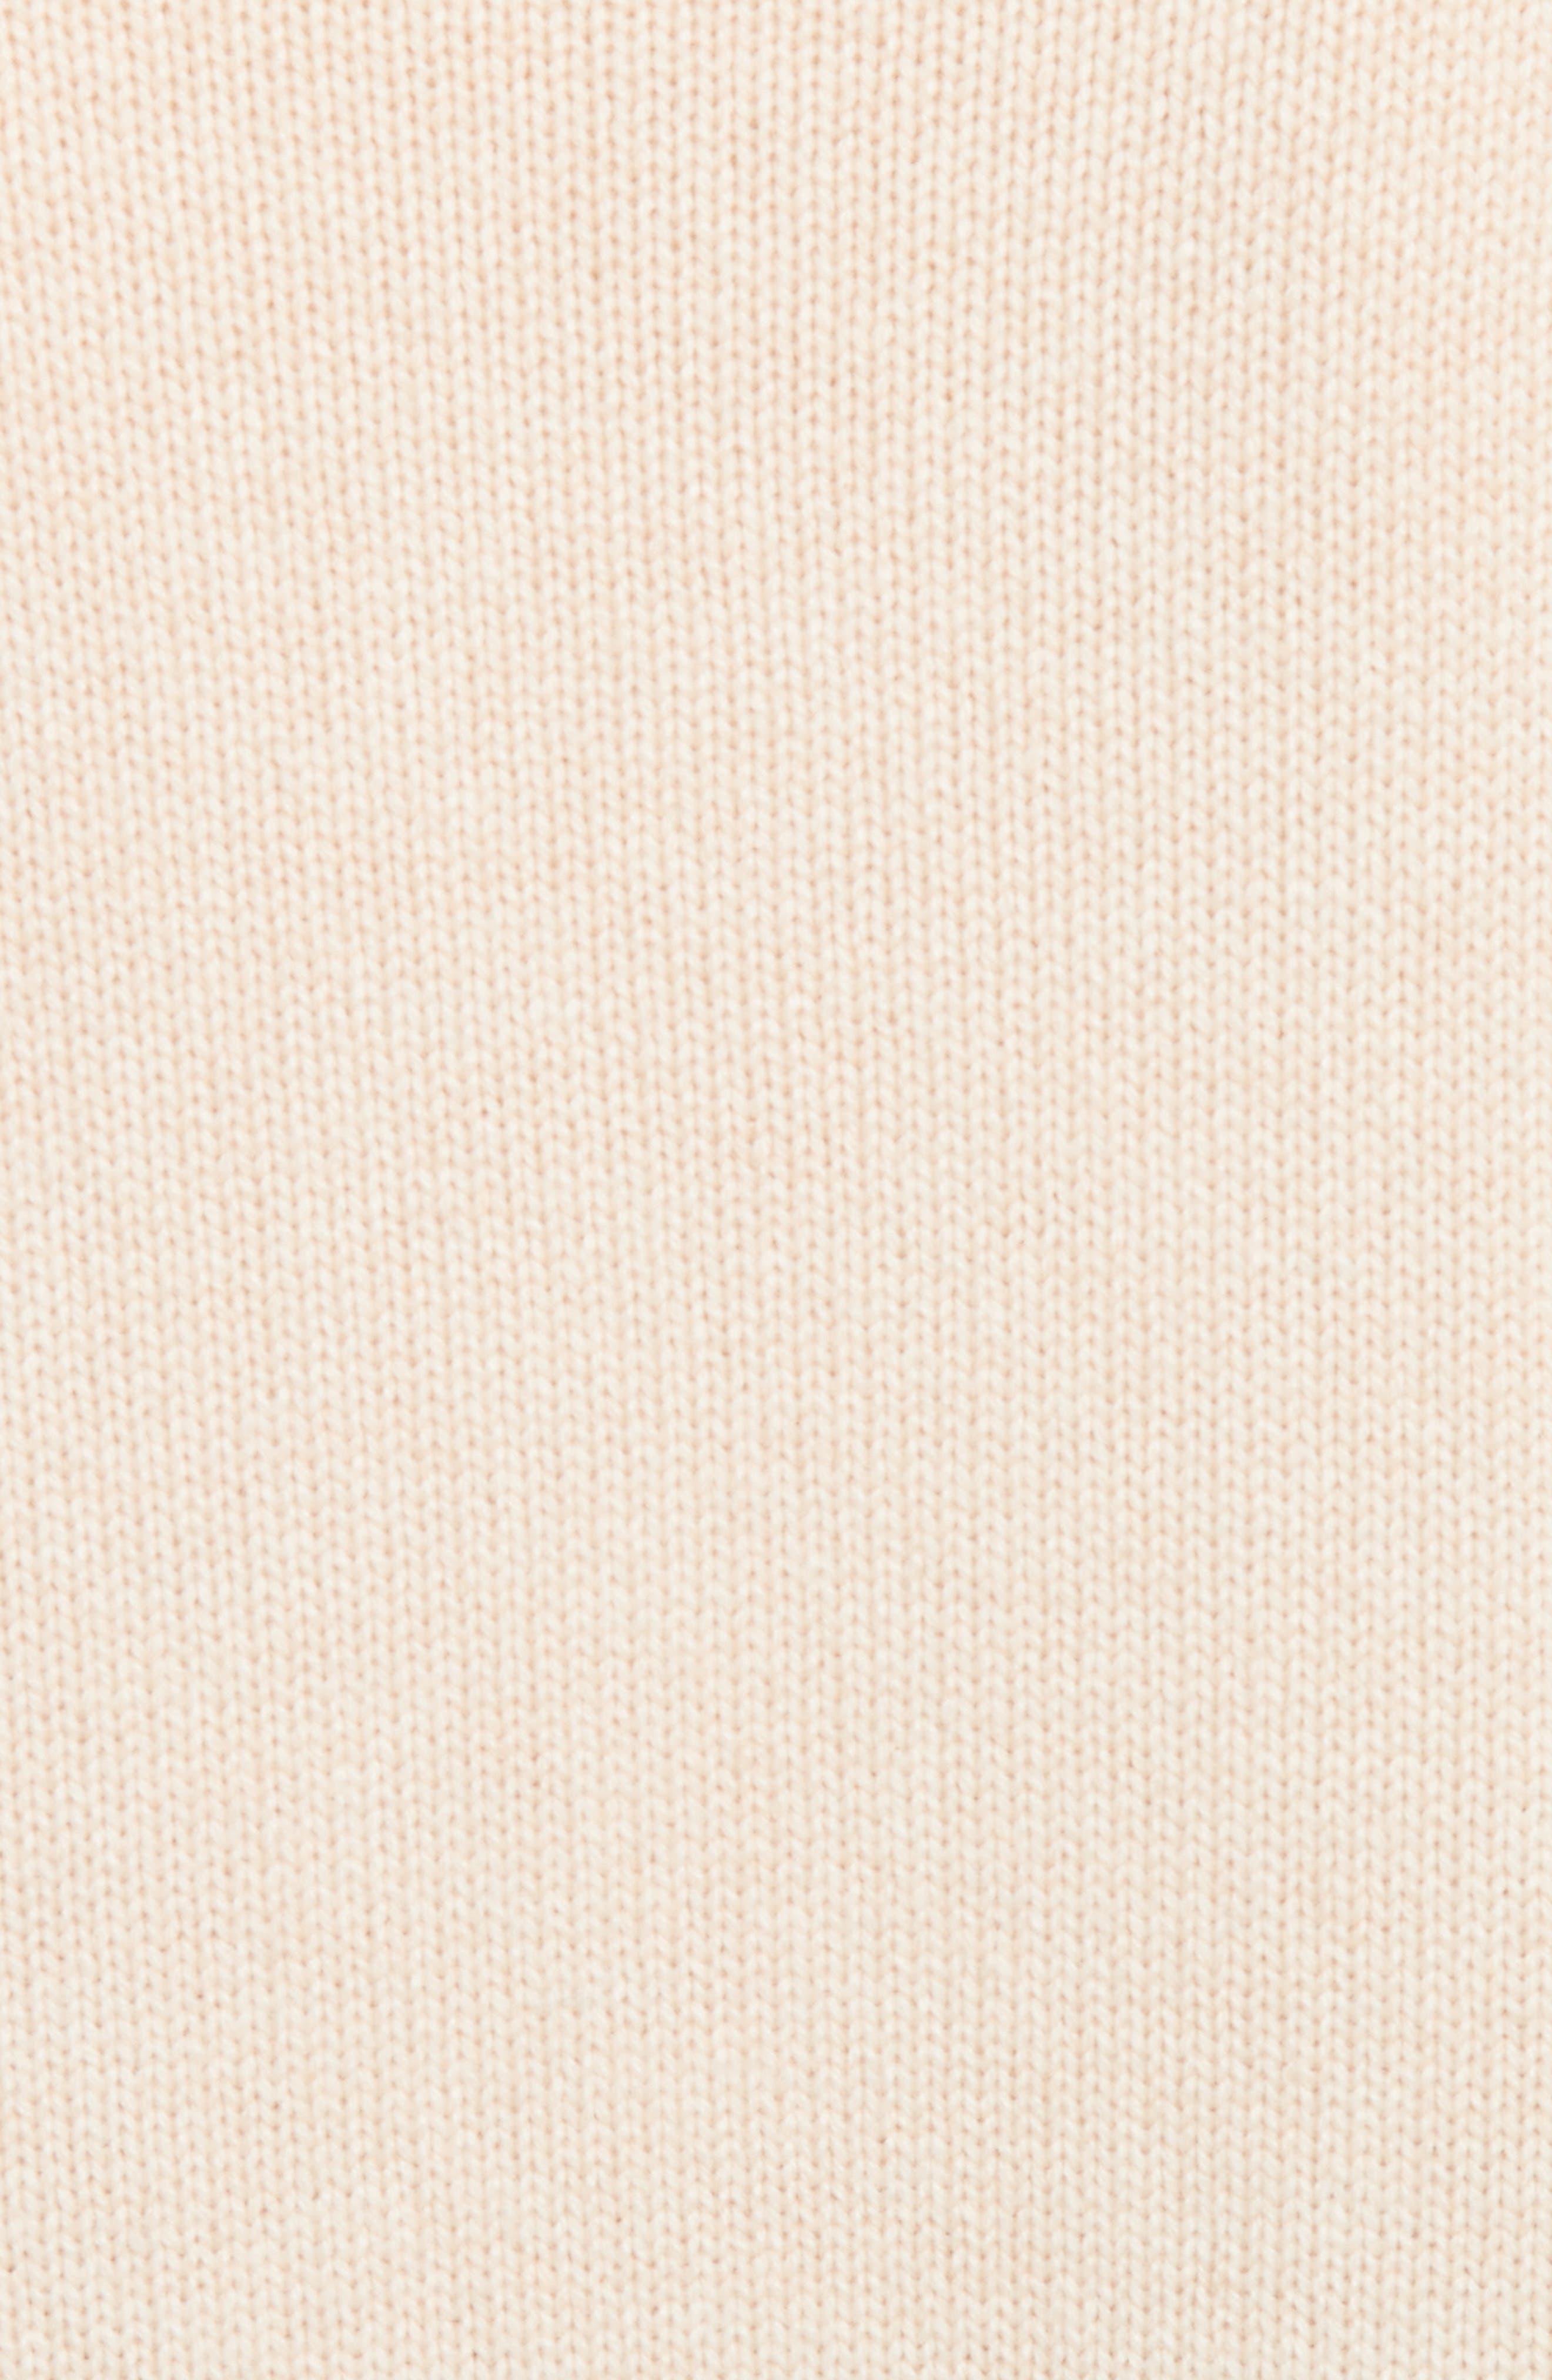 Colorblock Cashmere Turtleneck Sweater,                             Alternate thumbnail 5, color,                             650